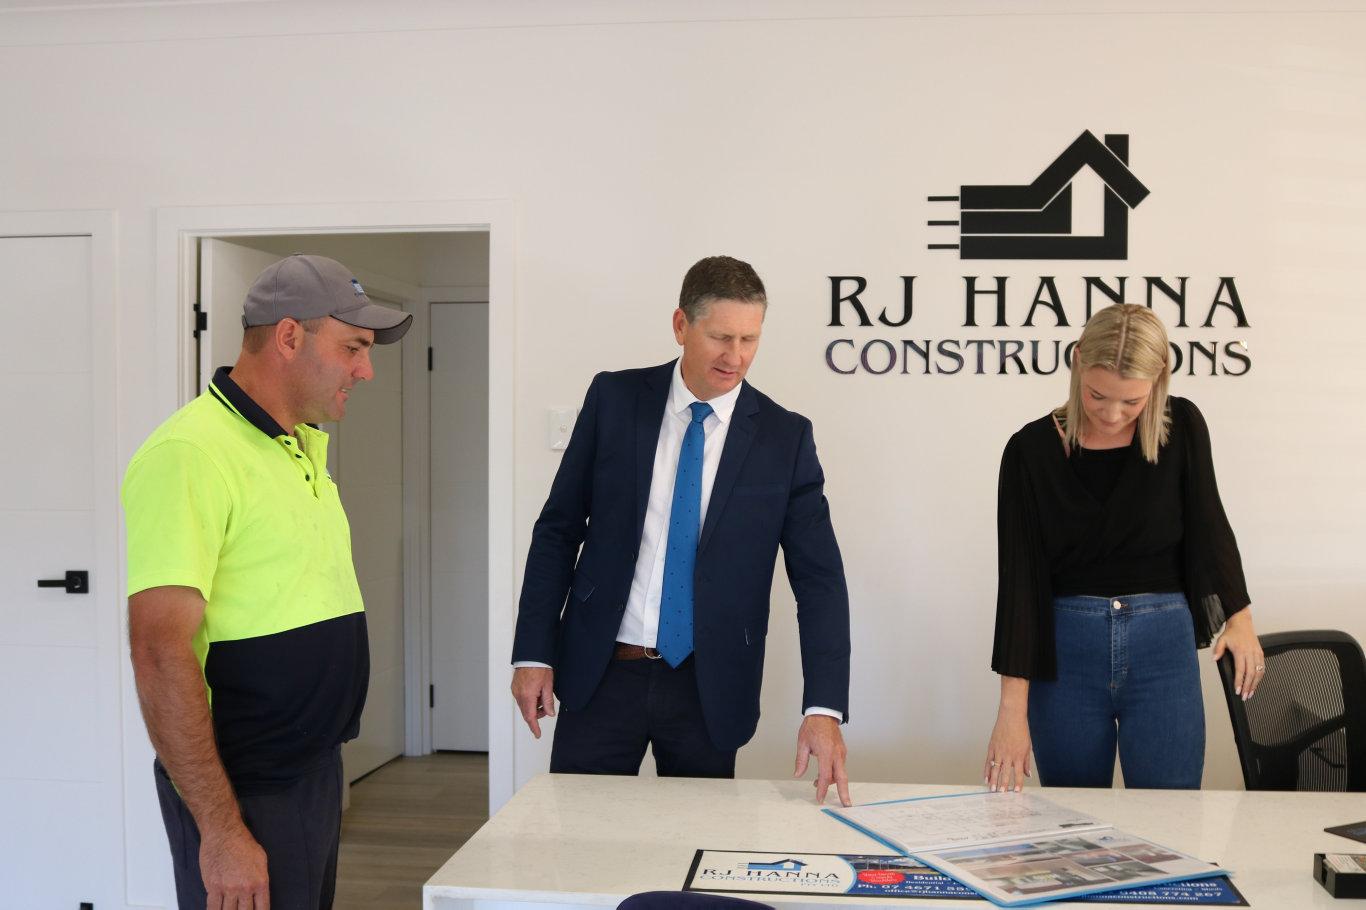 Robby Hanna and Lisa Hanna from RJ Hanna Constructions meet with mayor Lawrence Springborg (middle).